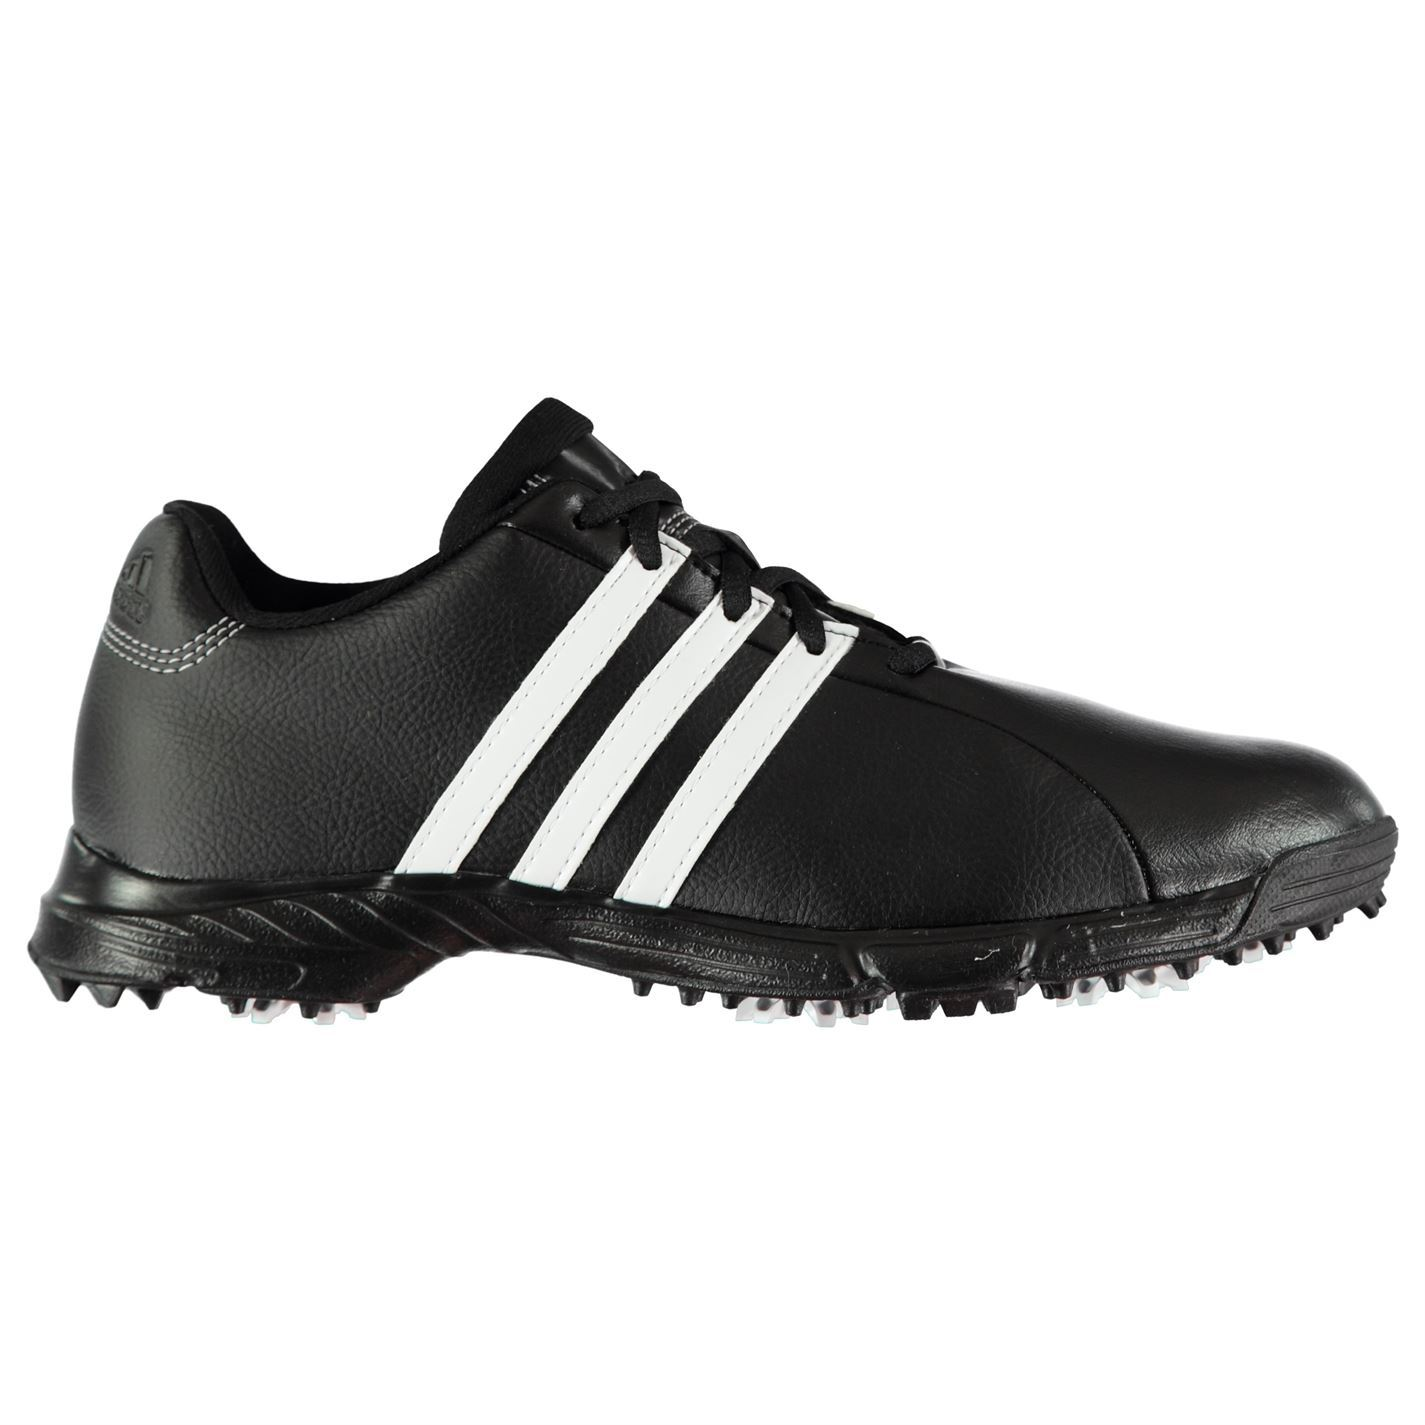 adidas-Golflite-Golf-Shoes-Mens-Spikes-Footwear thumbnail 6